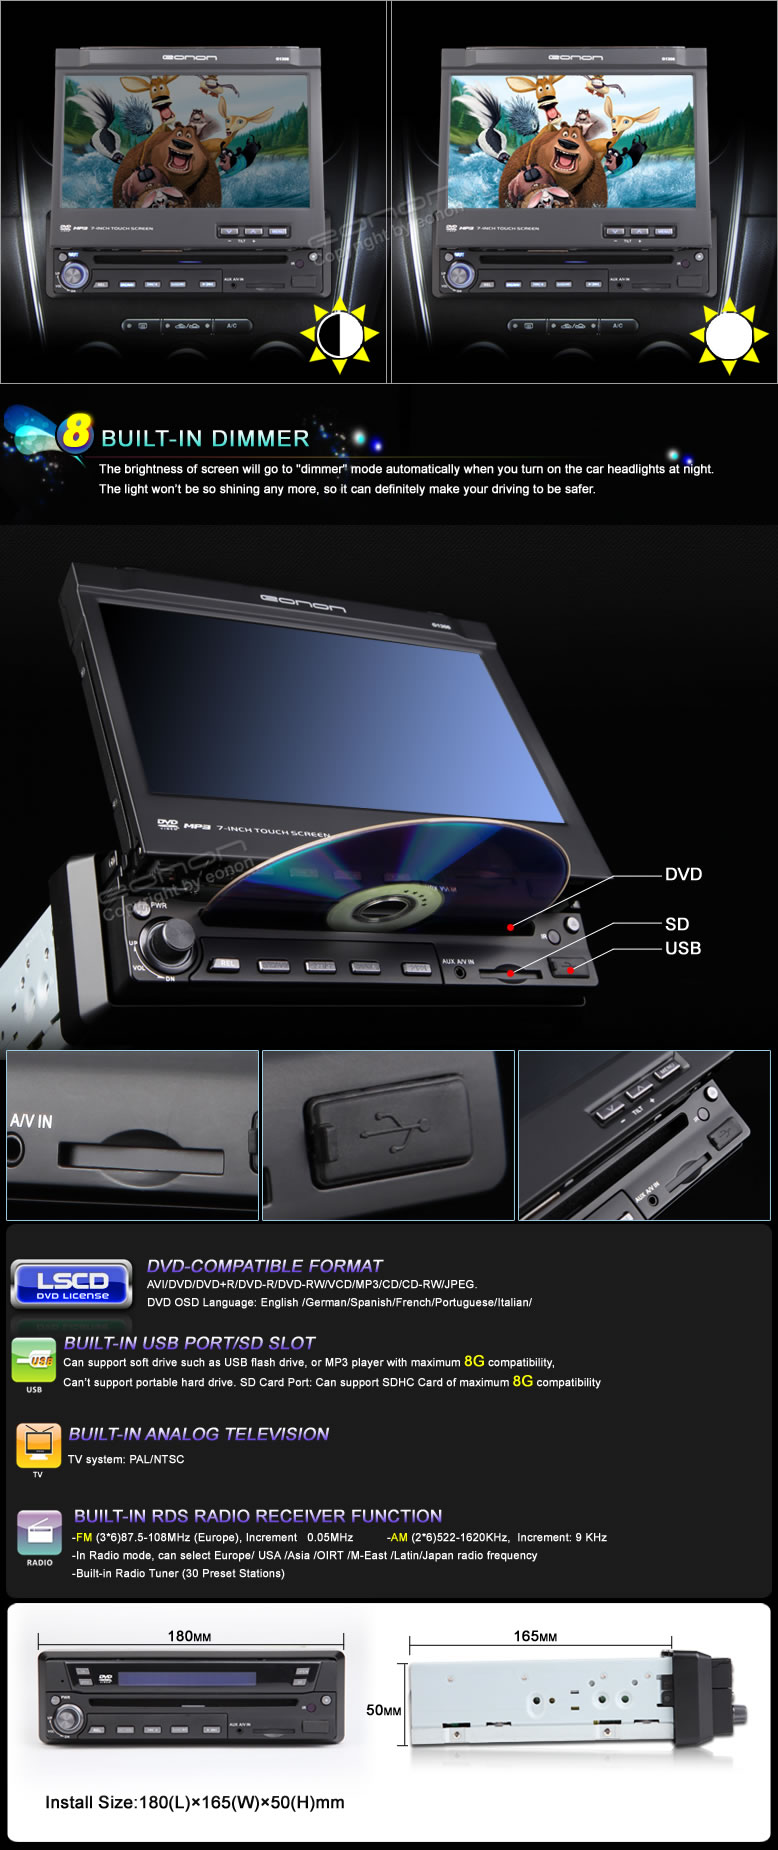 http://www.eonon.com/UserFiles/image/G1306-05.jpg